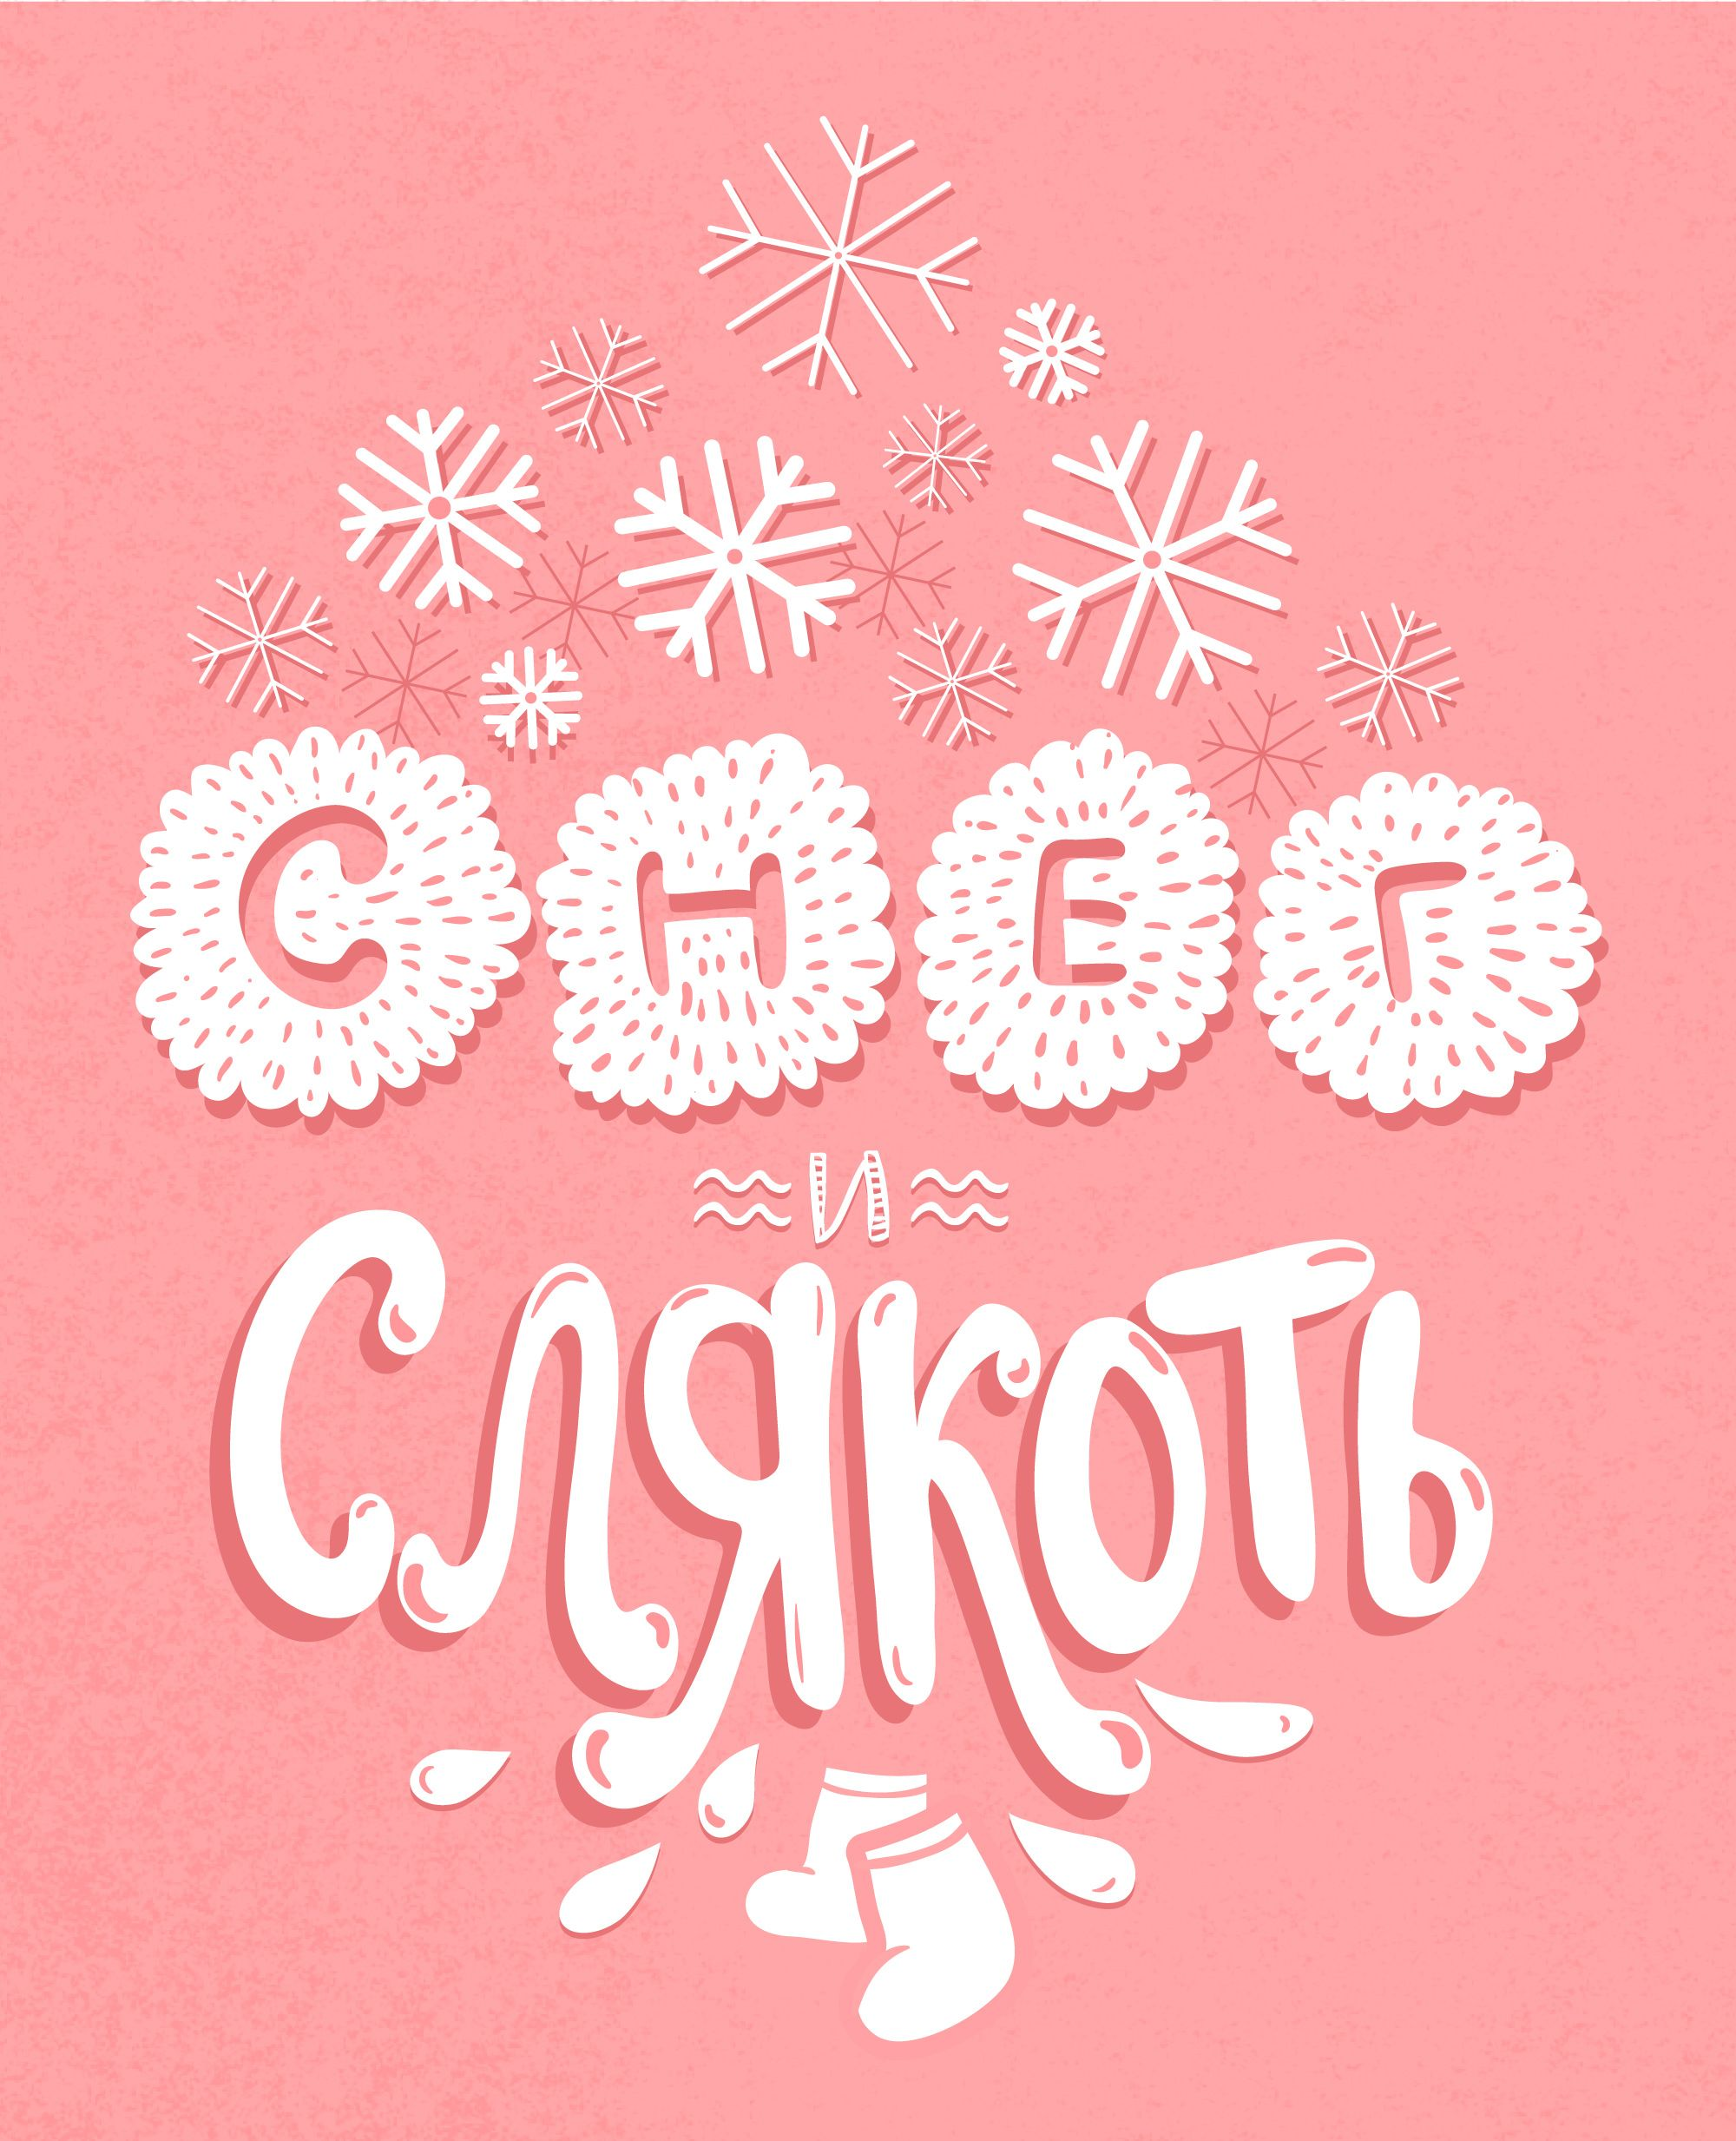 """Snow and Slush"" - Снег и слякоть. #Lettering #illustration #winter #cyrillic"